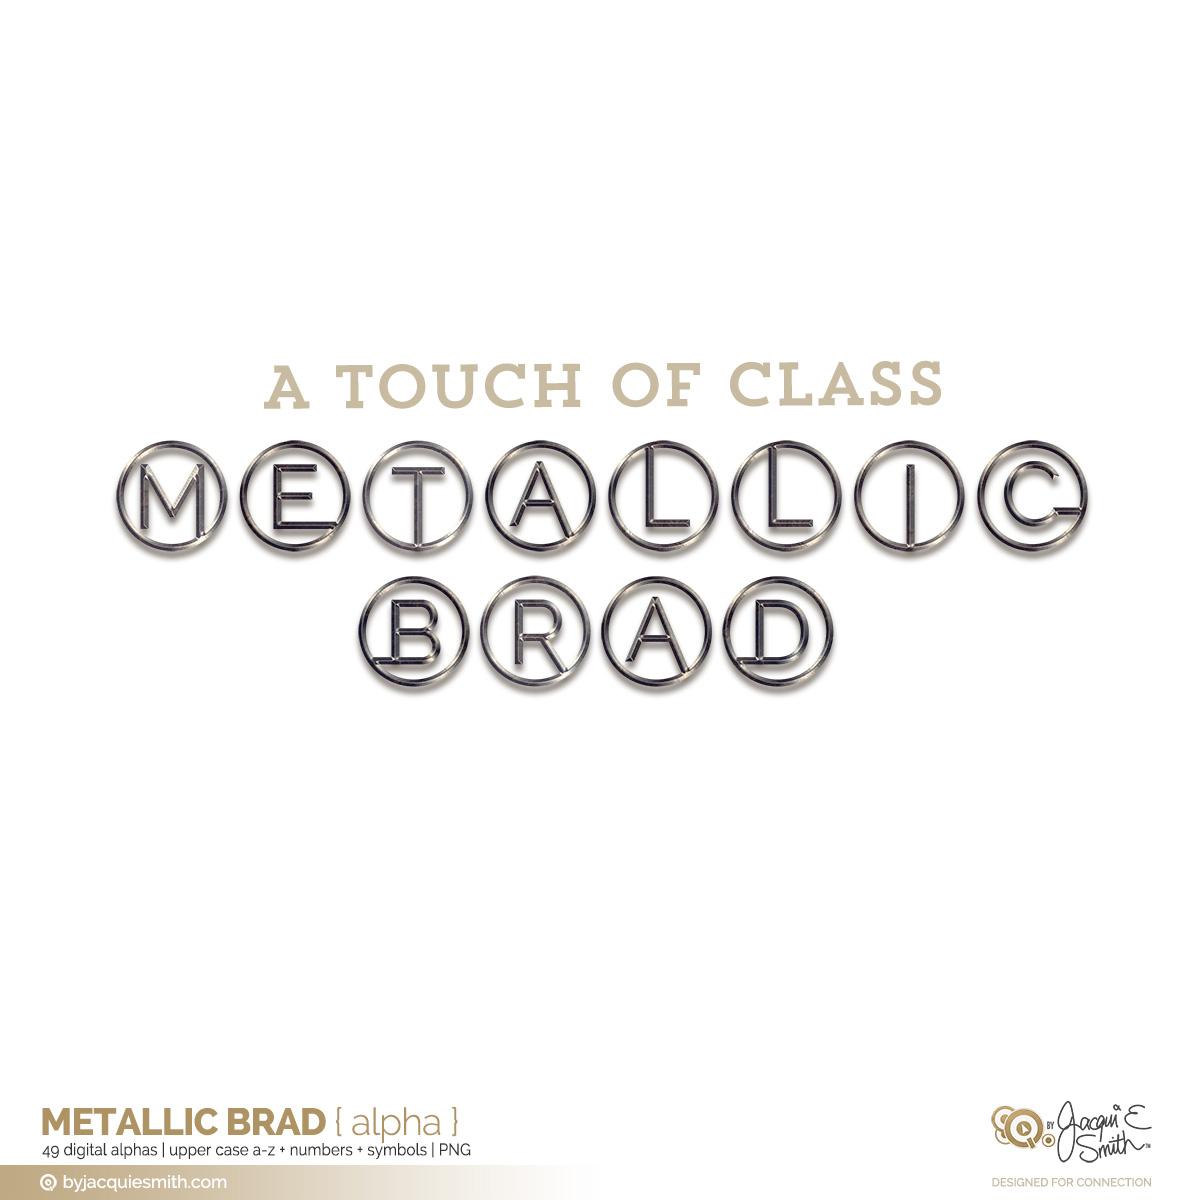 Metallic Brad digital alpha at byjacquiesmith.com